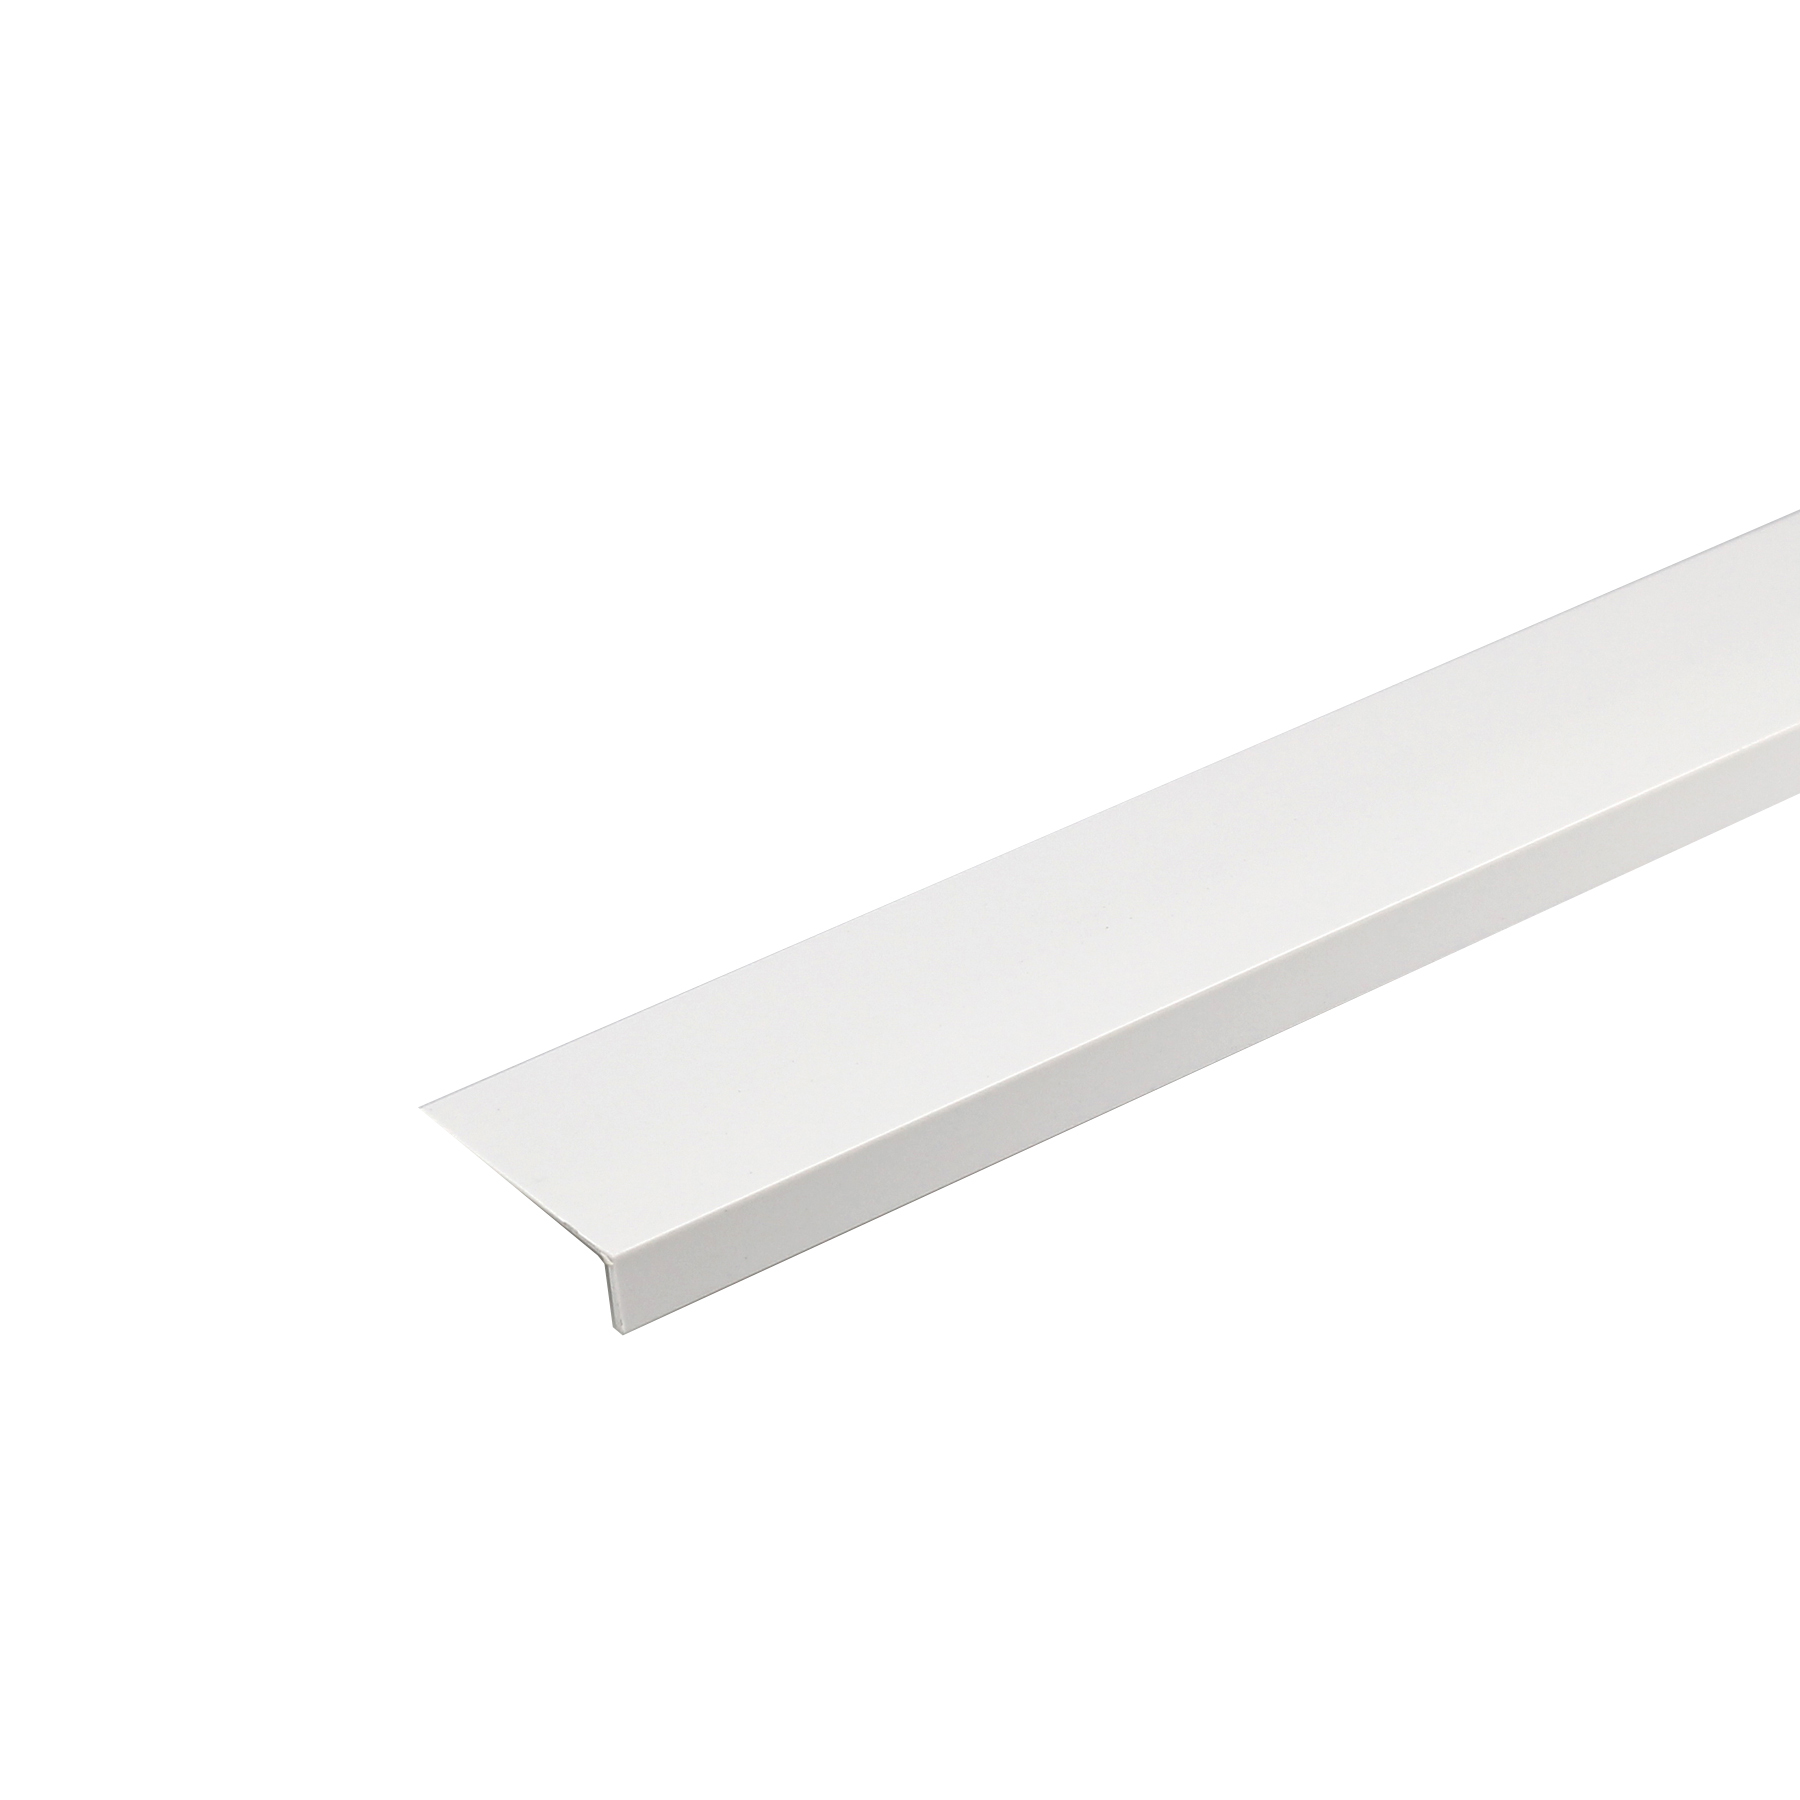 Perfil Canto PVC Porcelana 1mx2,5cm